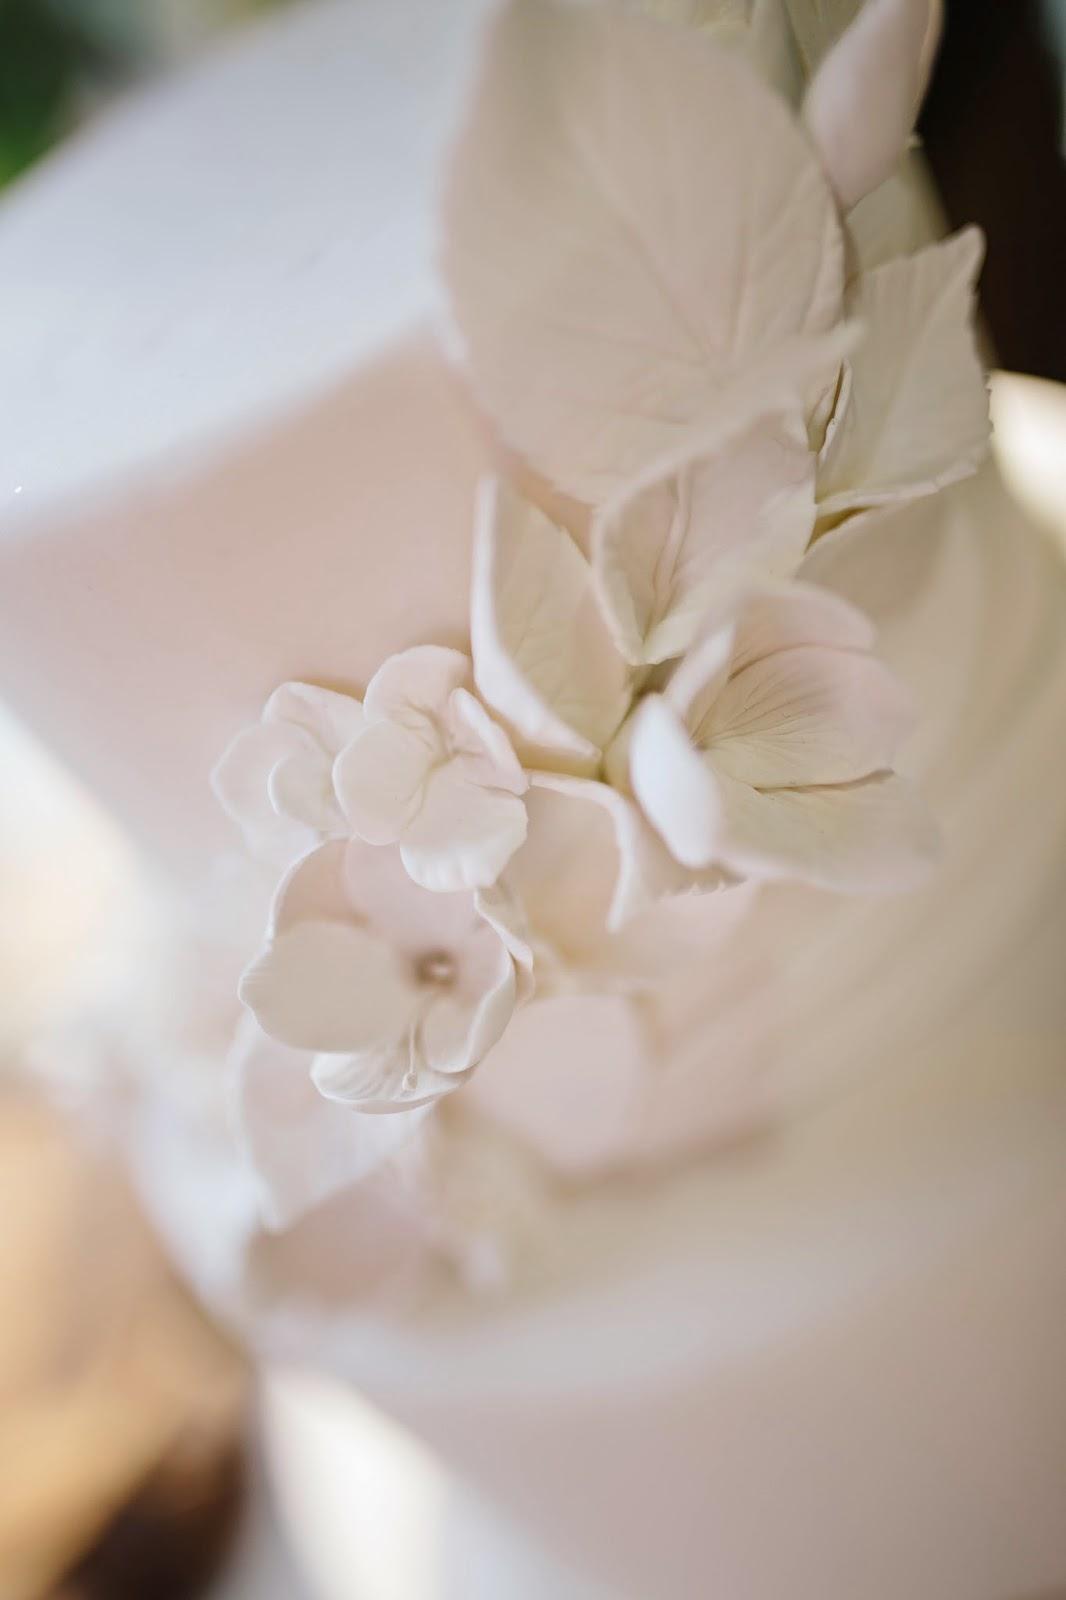 Main line wedding events anthropologie wedding registry allie white on white wedding cake details photo junglespirit Image collections